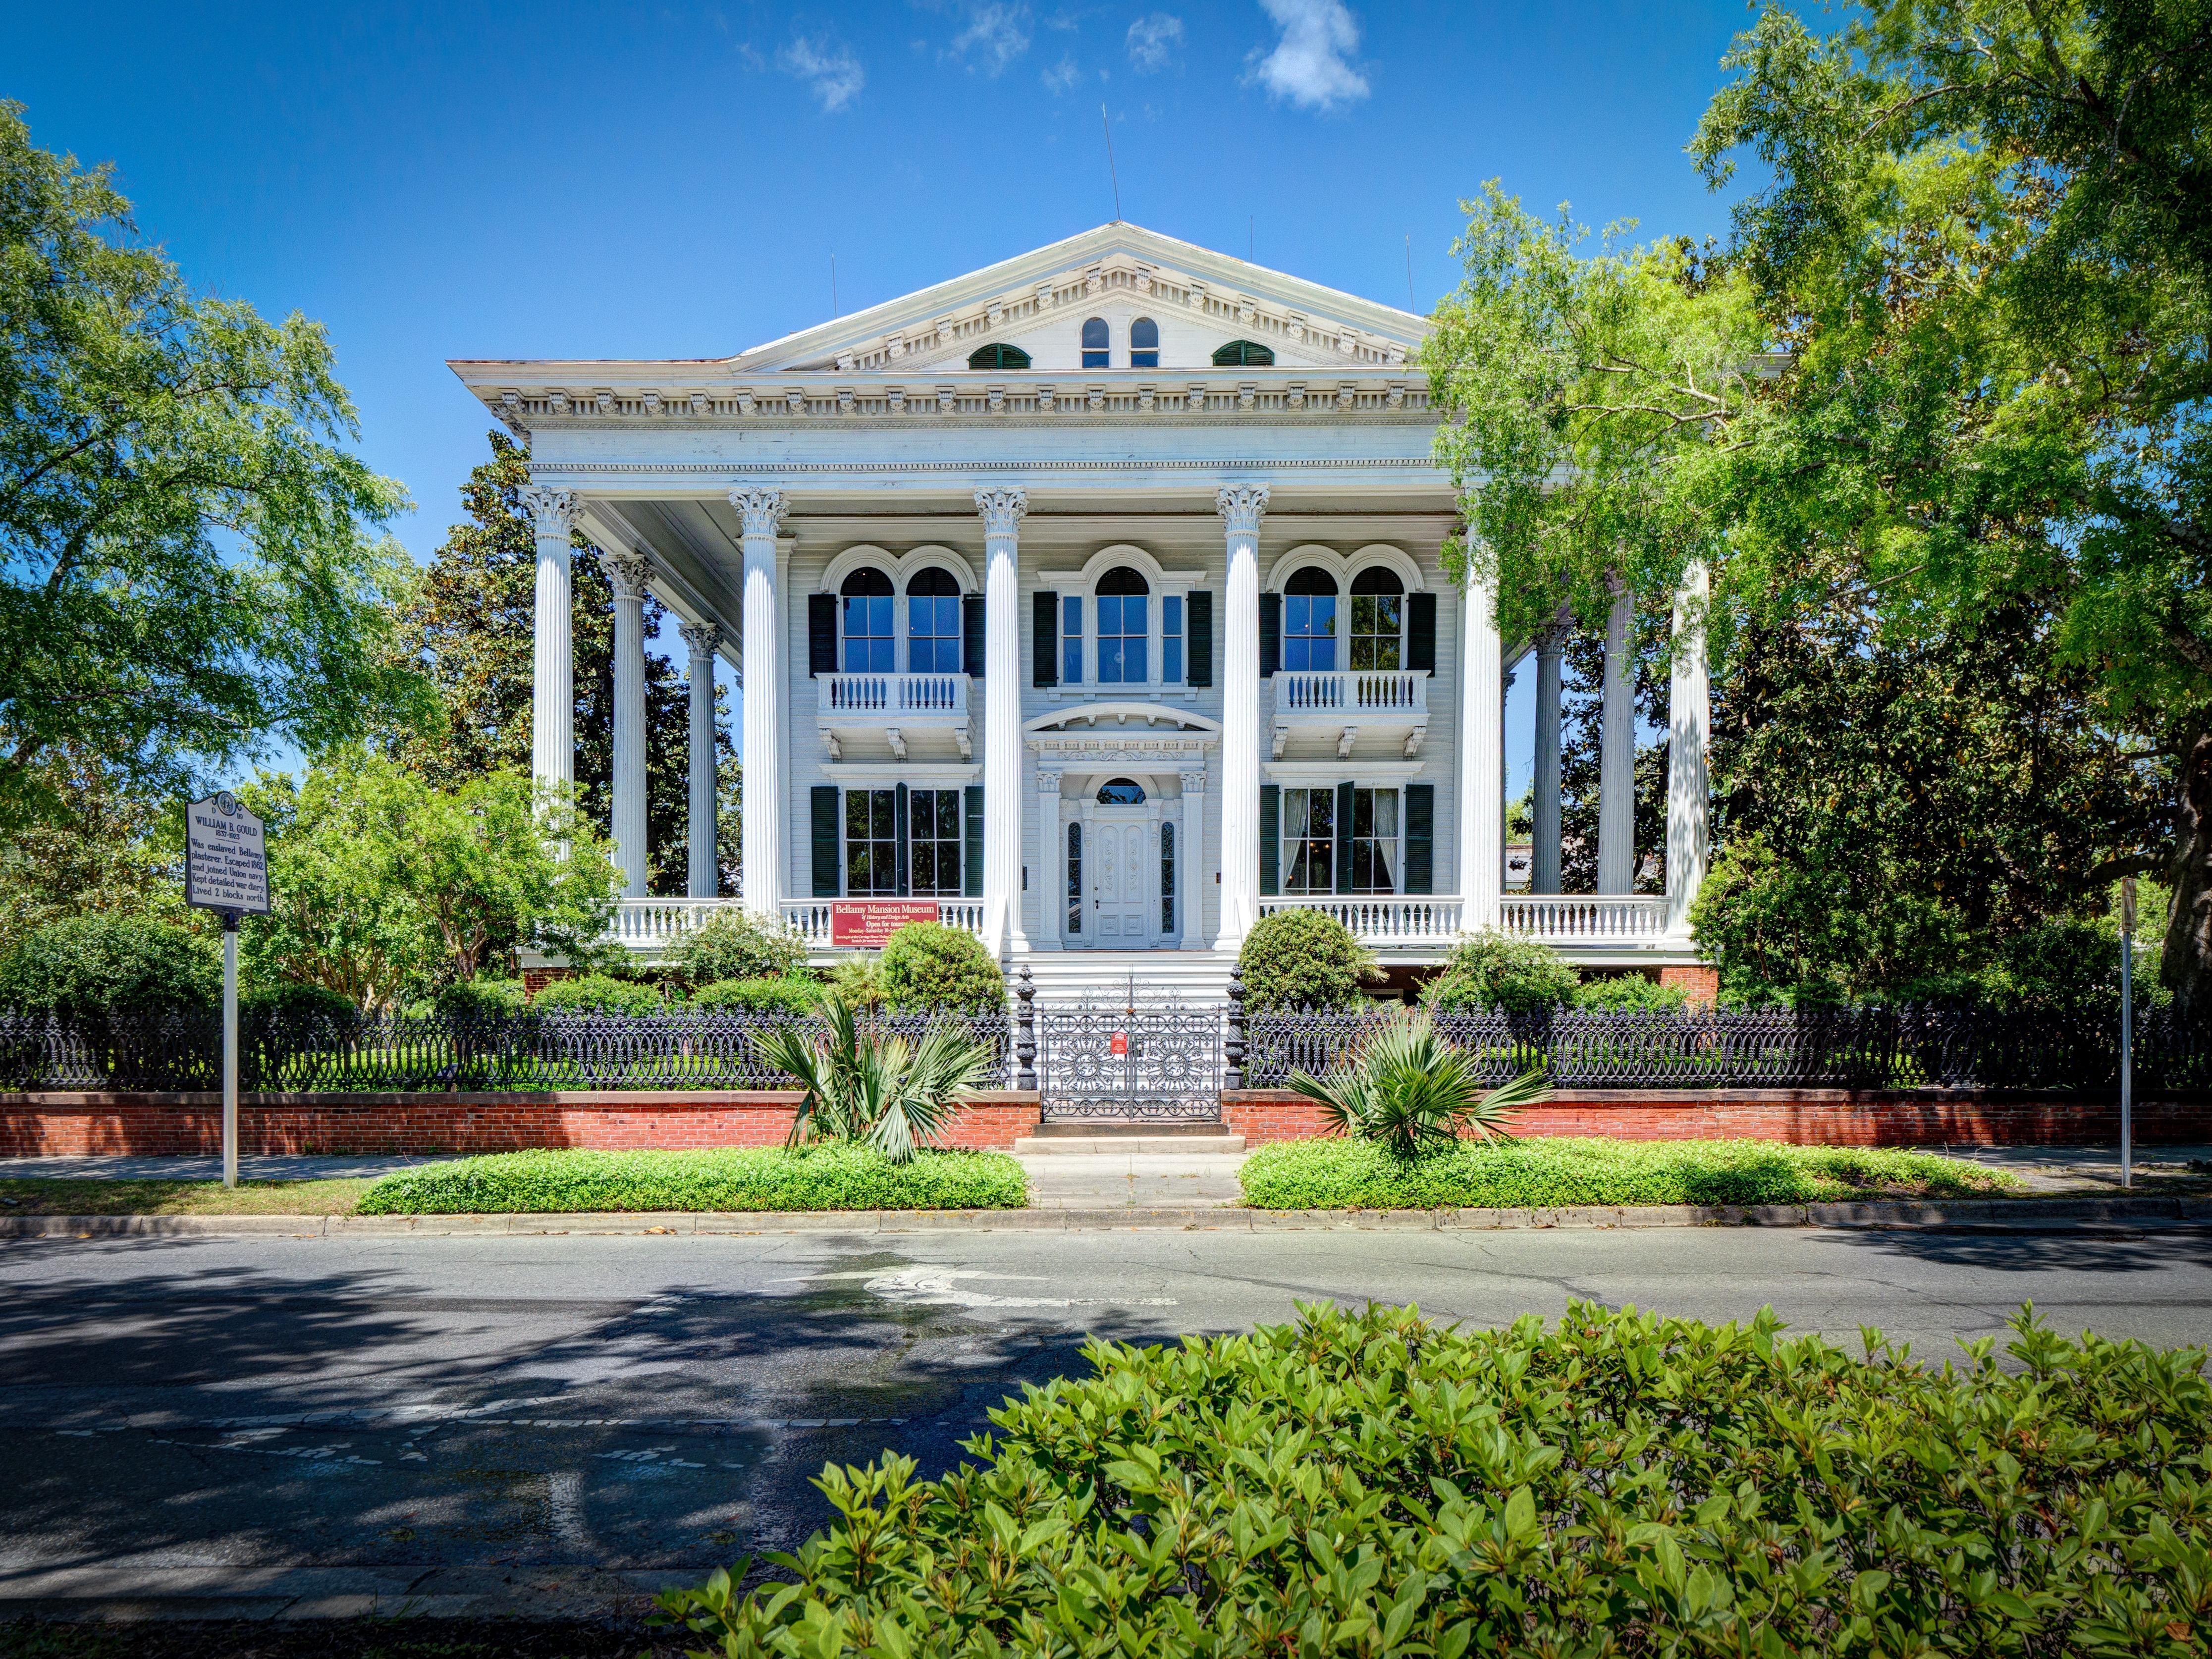 Bellamy Mansion, Wilmington. Photo credit: David Strevel, Capital City Camera Club.